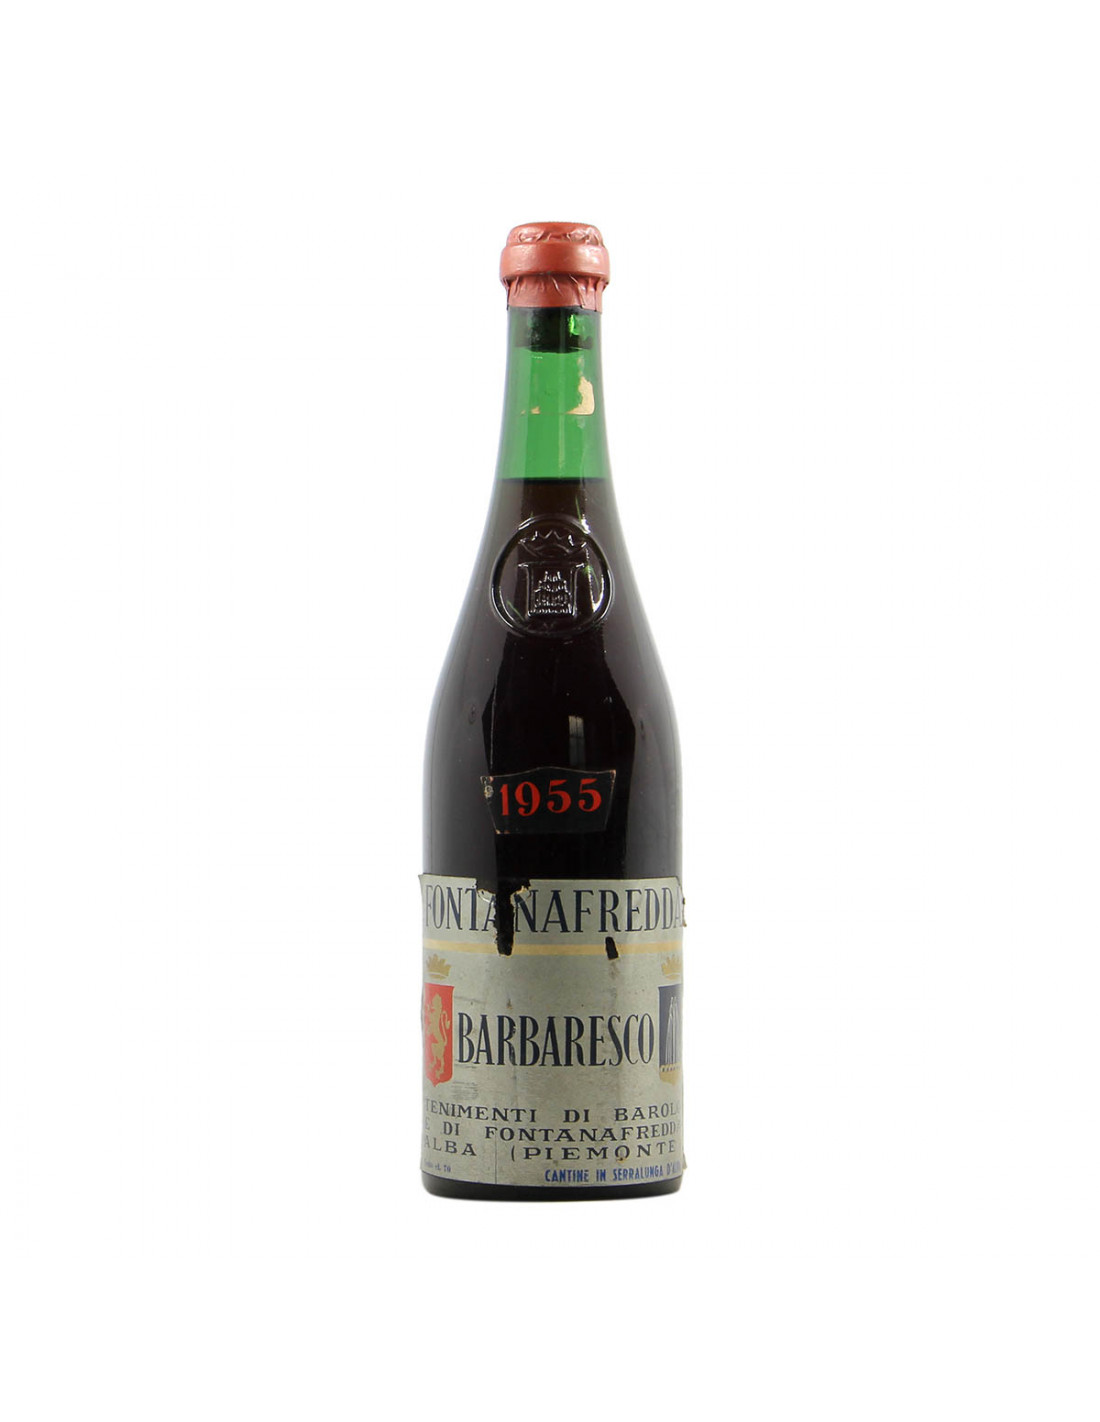 Fonatanfredda Barbaresco 1955